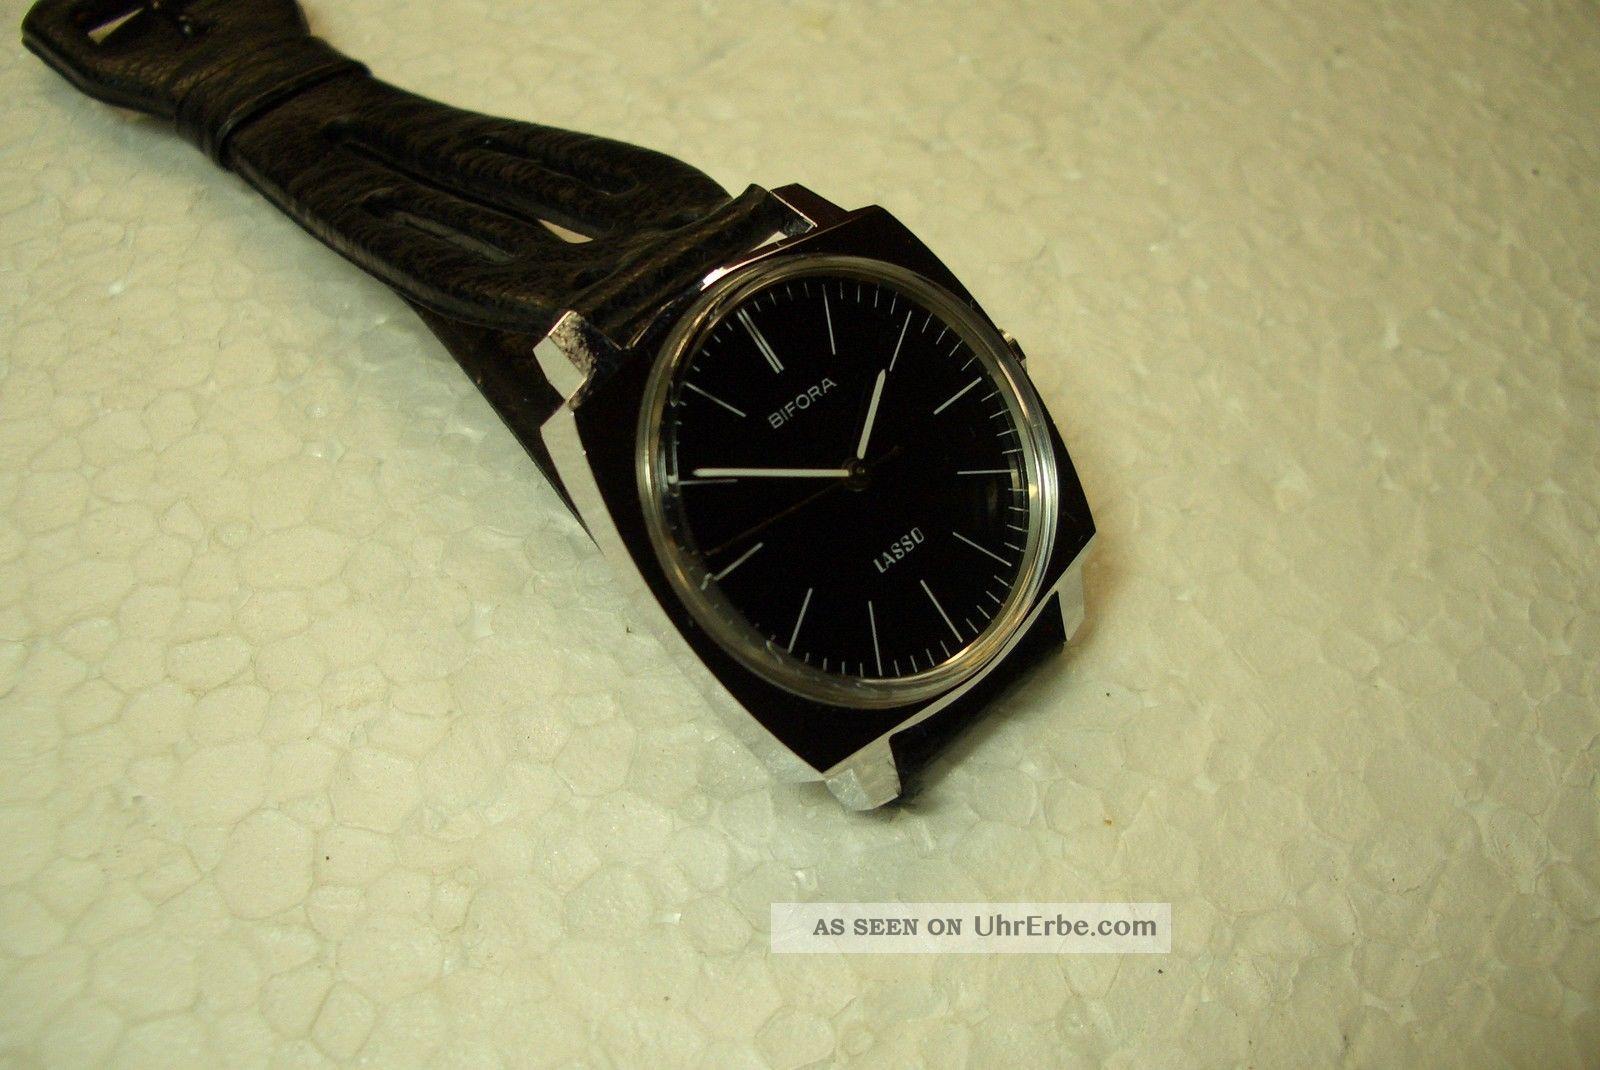 Bifora Nos Alte Herren Armbanduhr 70 ' Er J.  Kal.  B 91/1 Sehr Guter Gebr Zust. Armbanduhren Bild